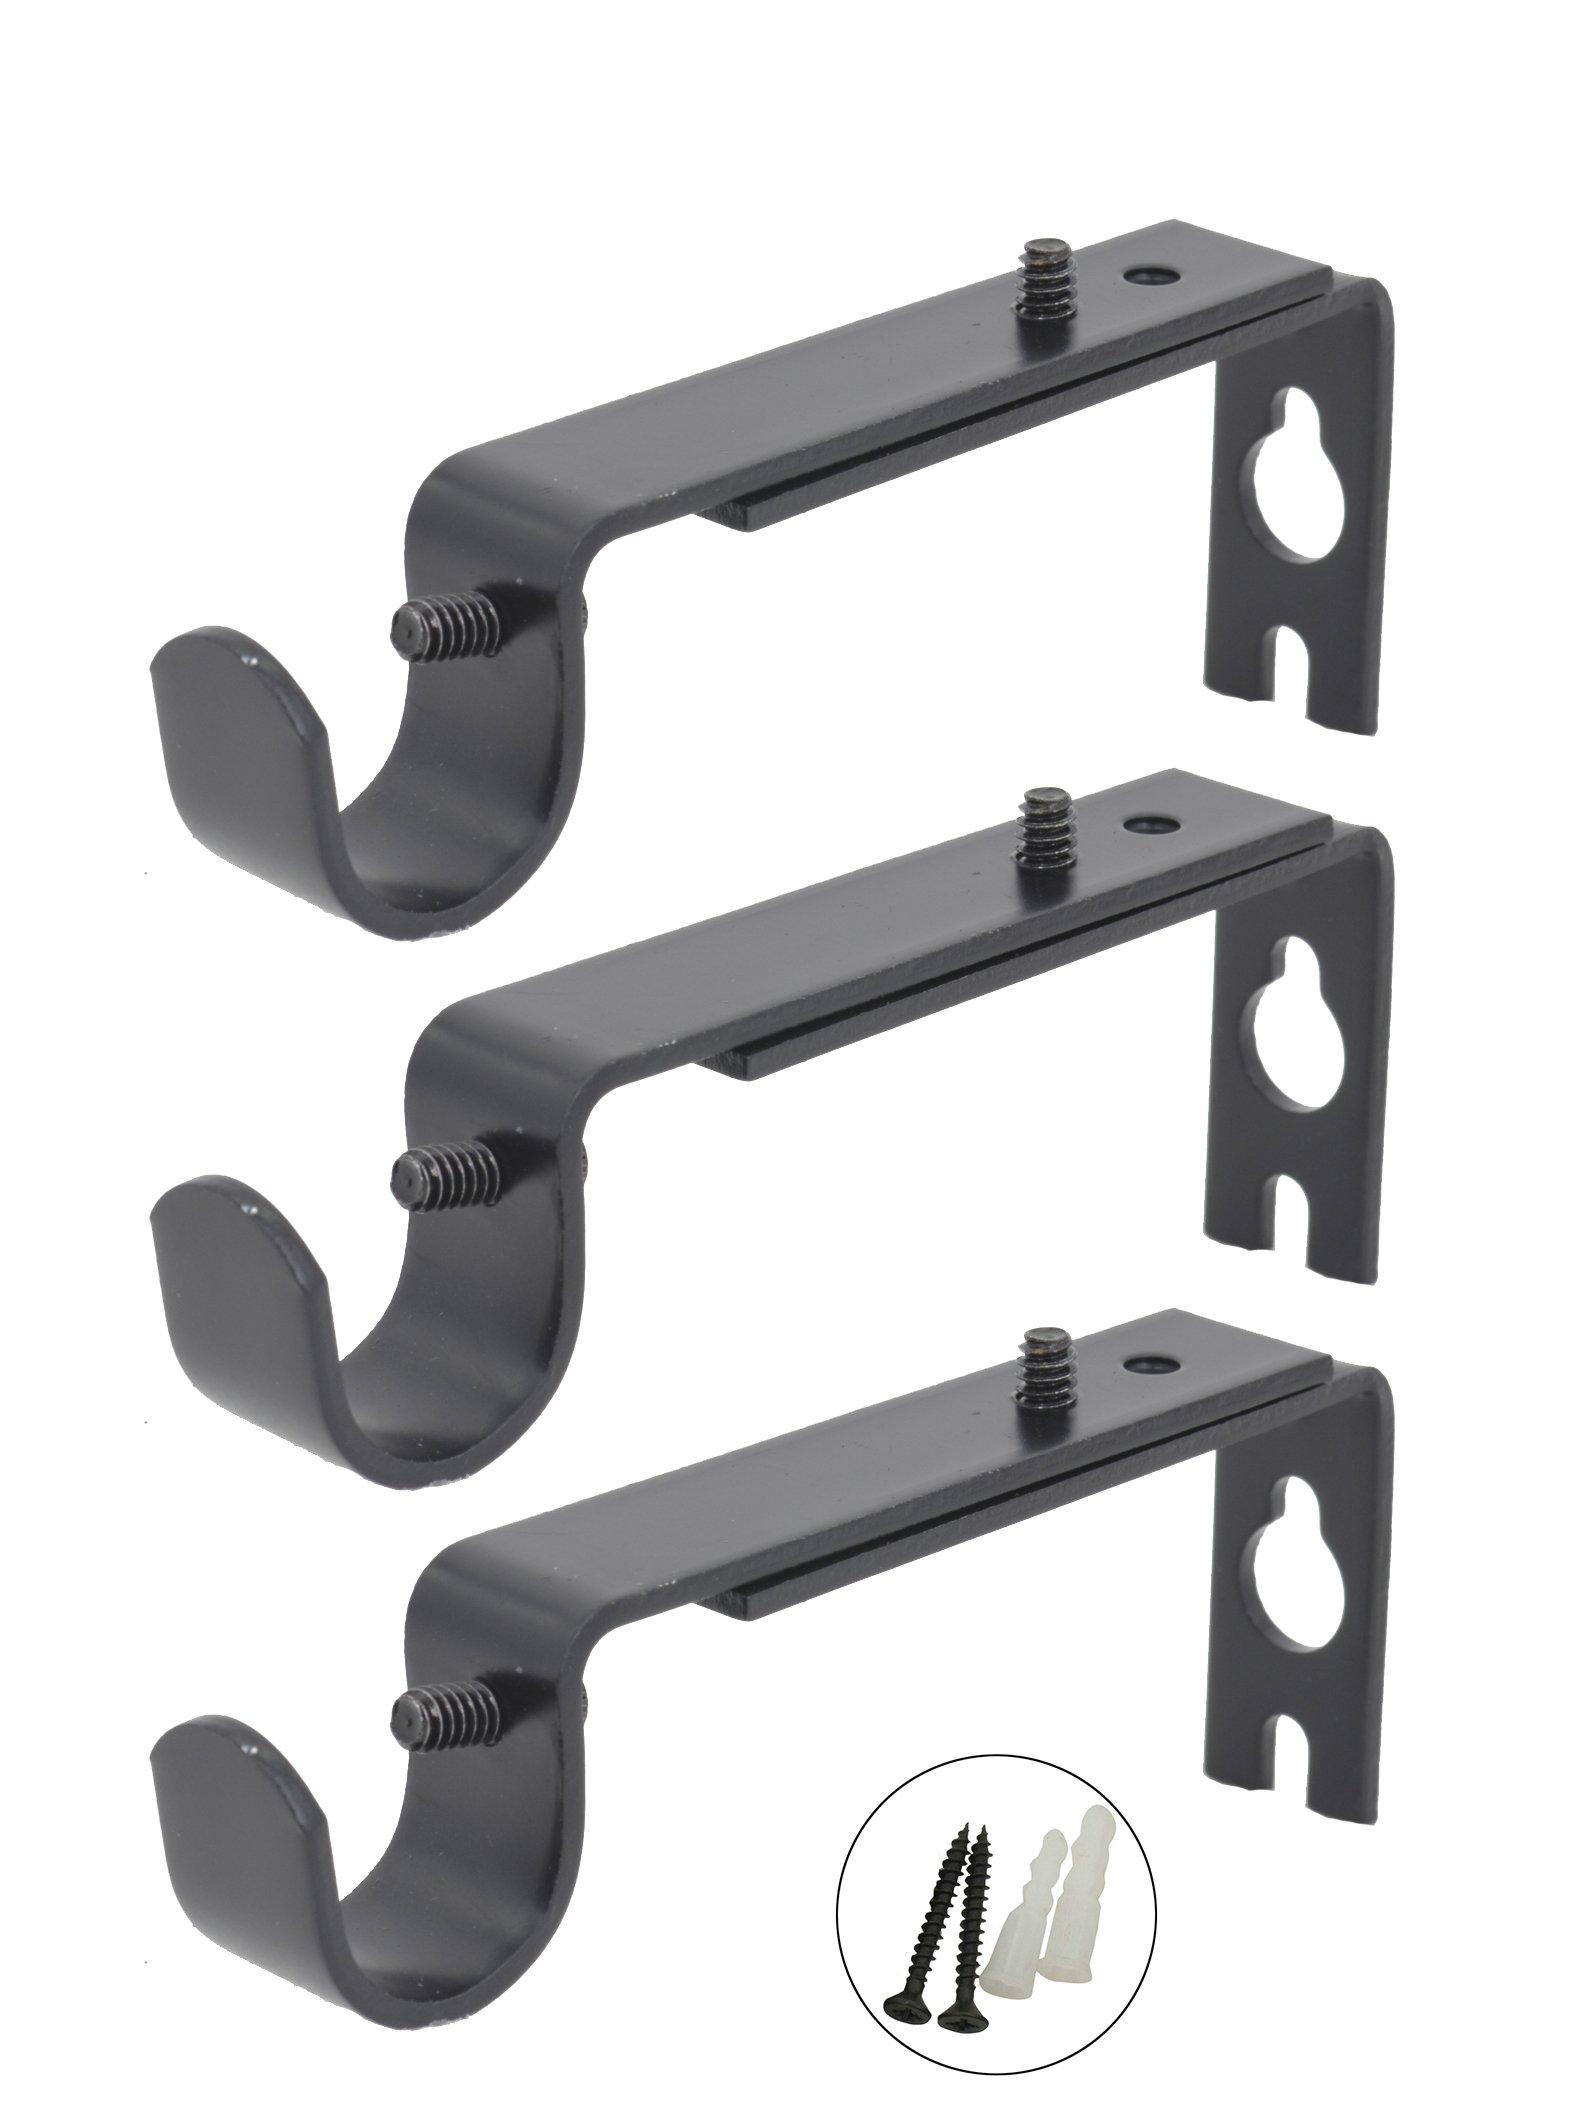 AddGrace Adjustable Curtain Rod Brackets Rod Holder/Bracket for Drapery Rod/Window Drapery (Set of 3, Black)